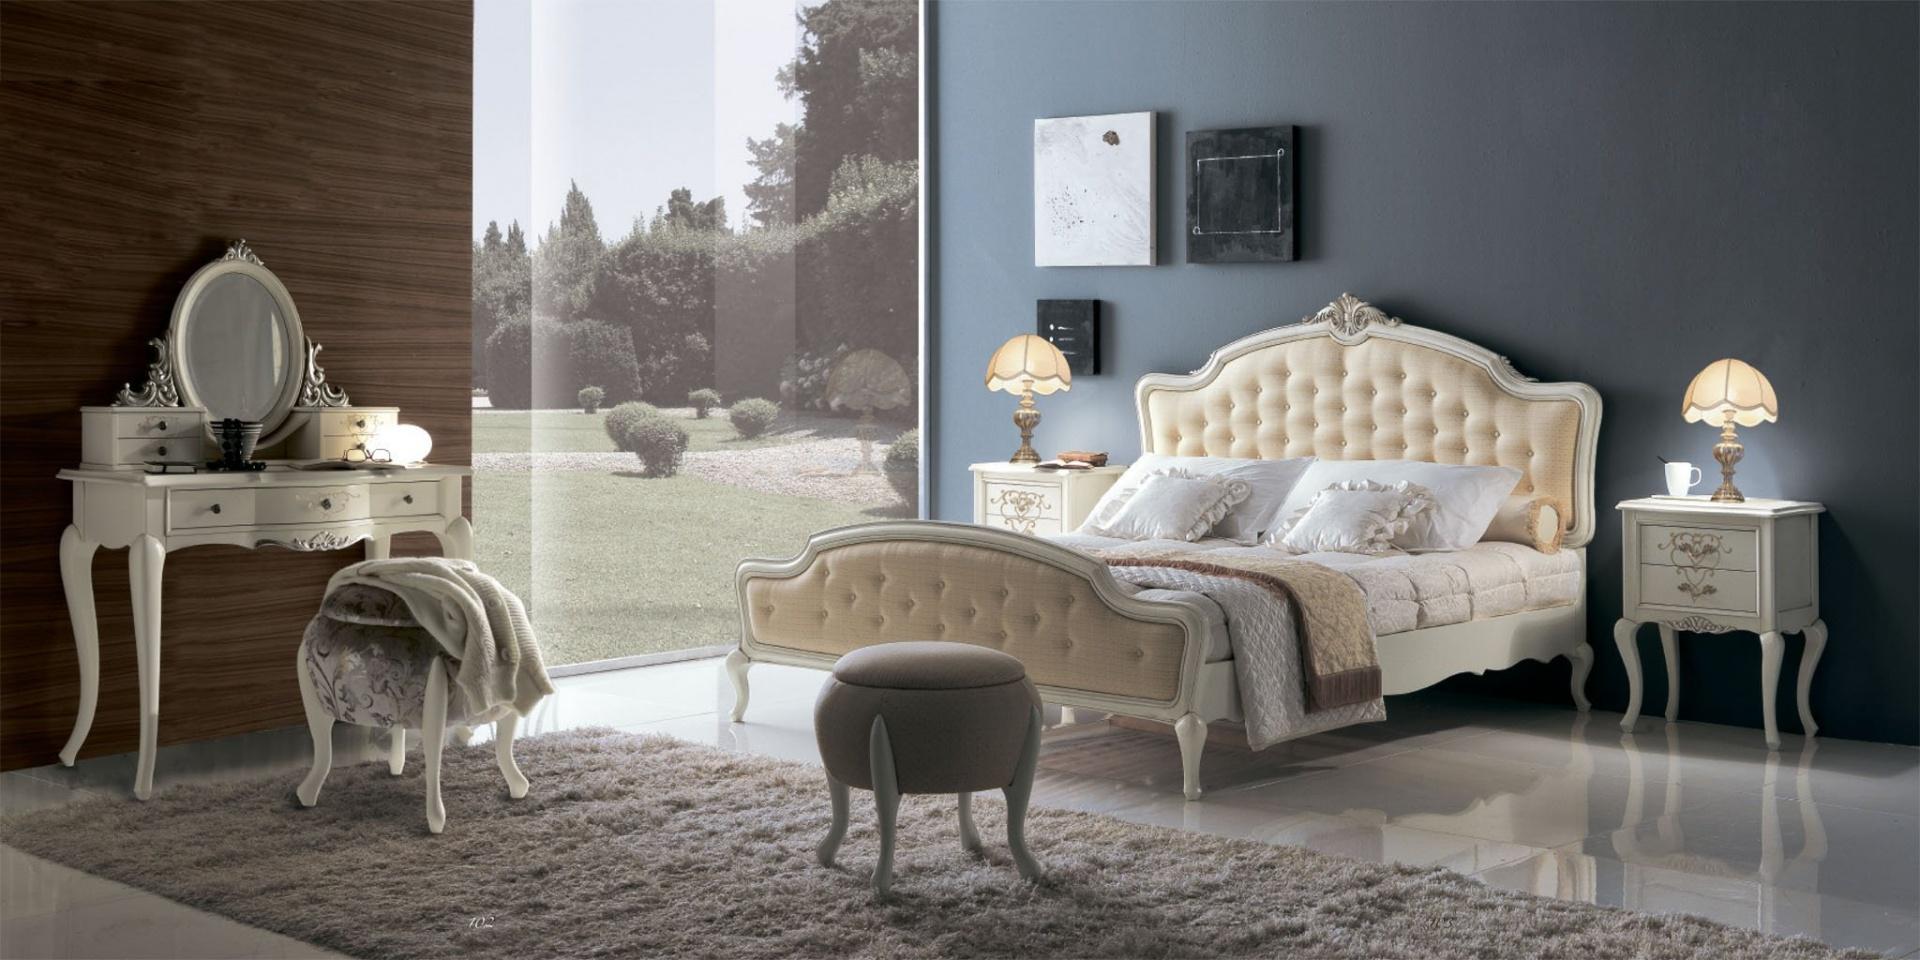 Memorie veneziane стильная спальня IM84